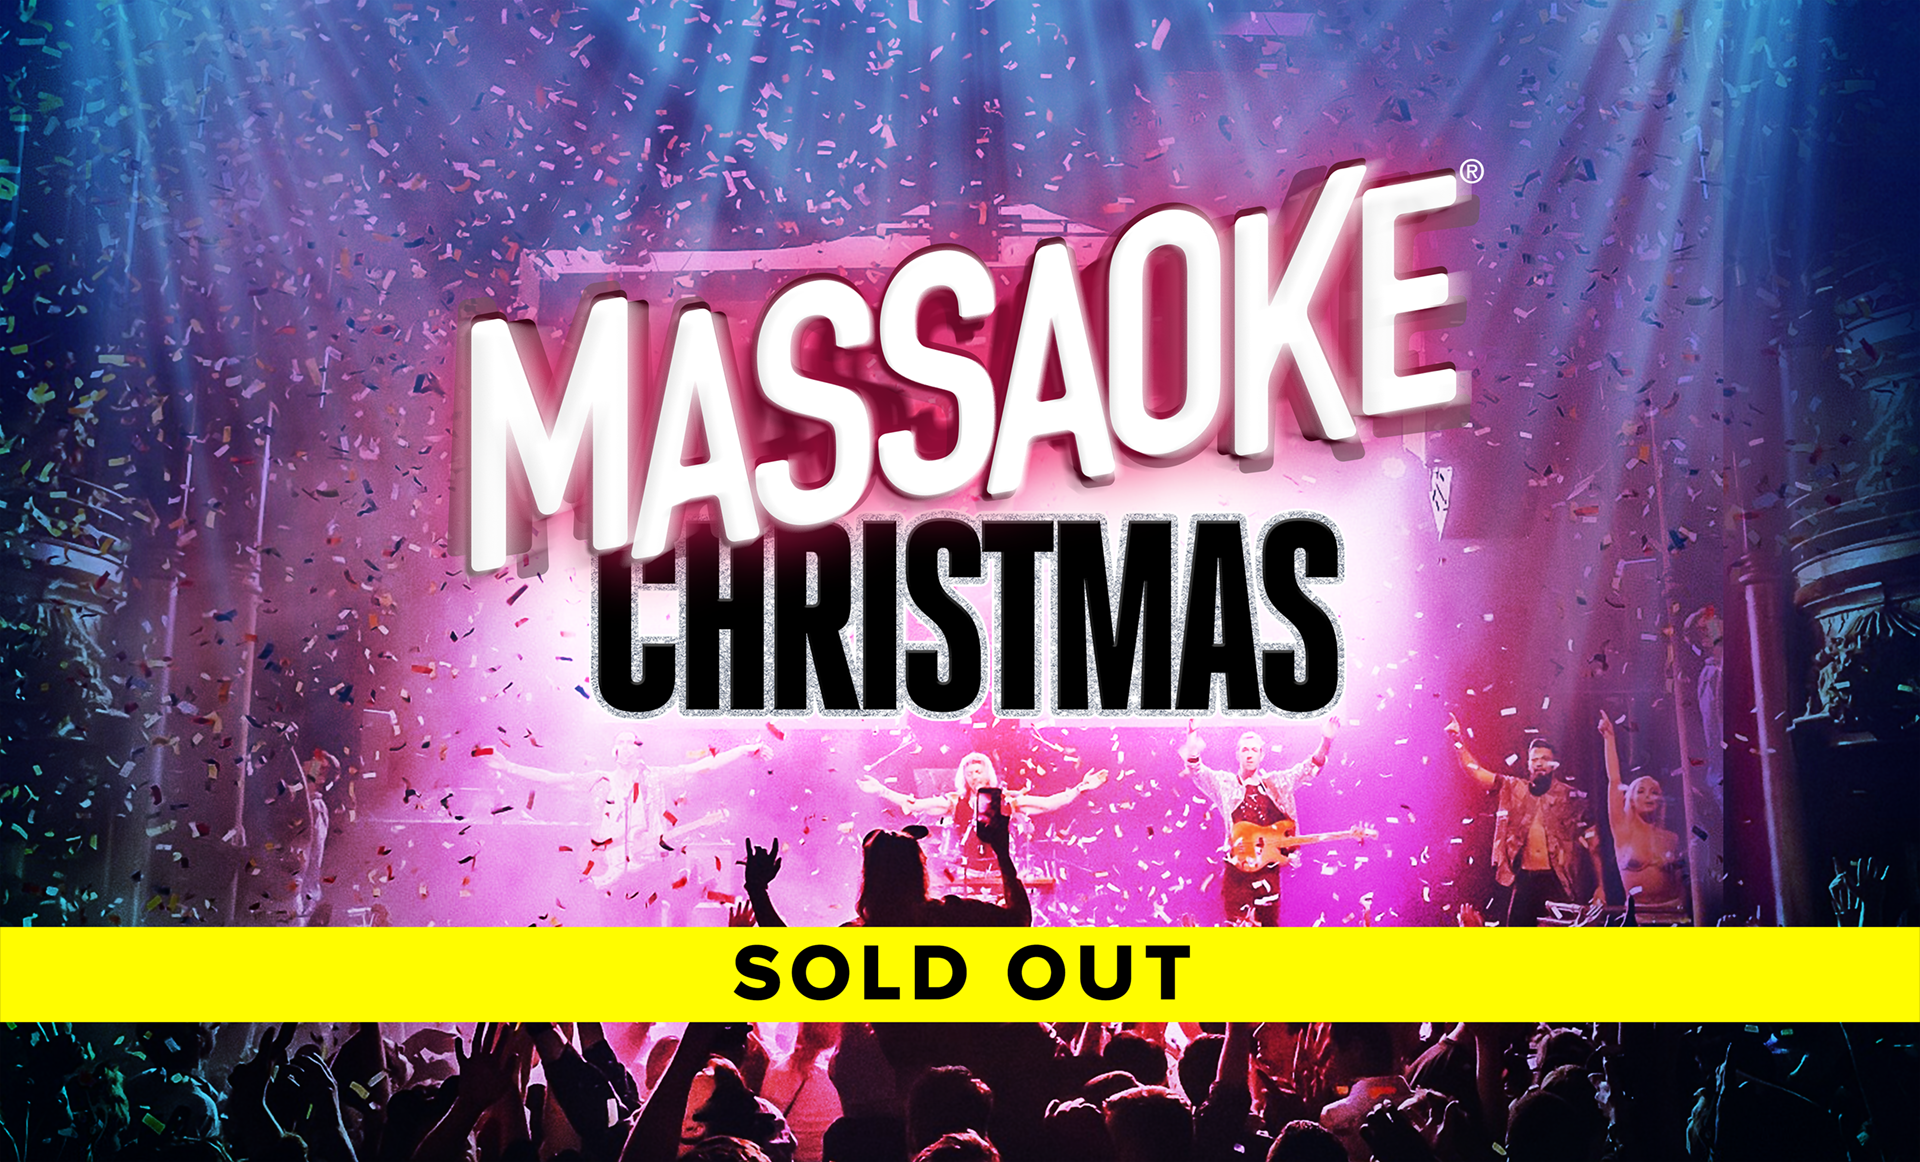 Massaoke-Xmas-2019-Website1.jpg